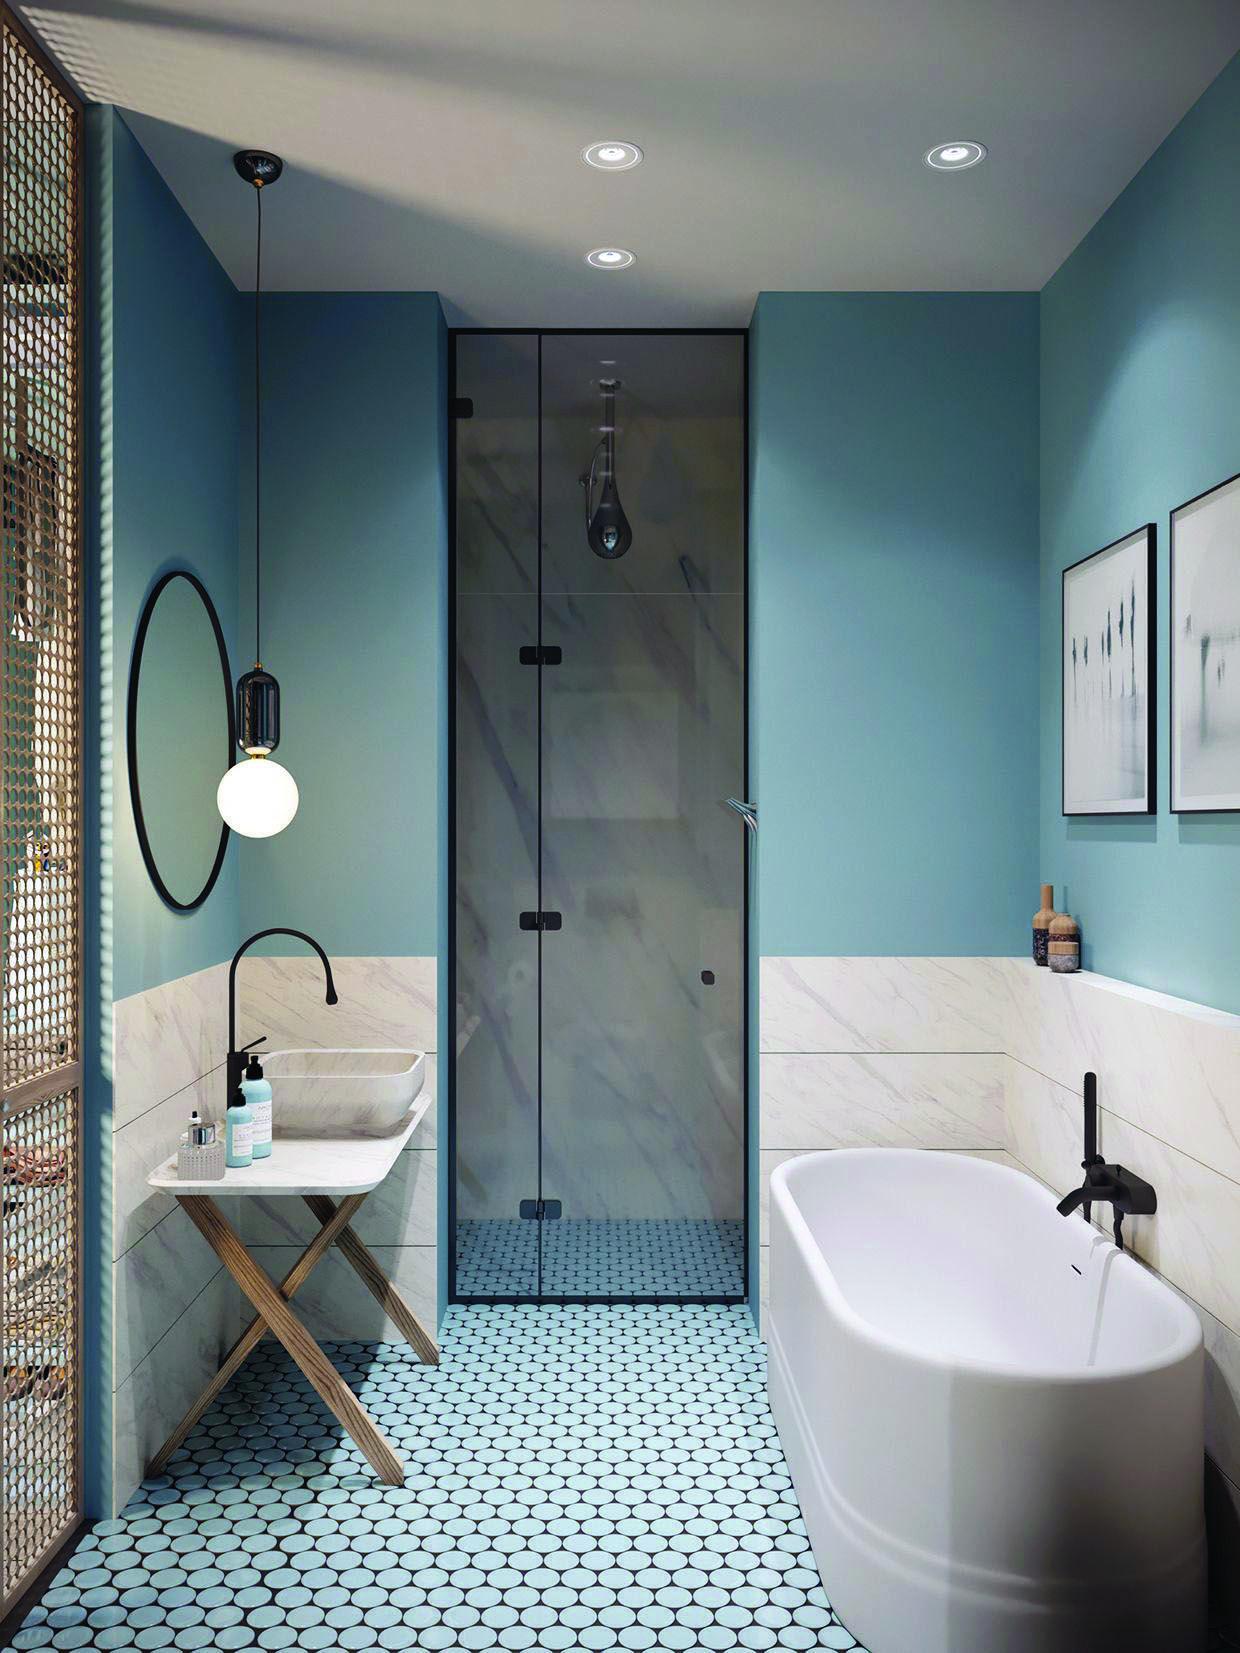 Trendy Bathroom Wall Tiles Kerala That Look Beautiful Bathroomwalltilesdesignkerala Small Bathroom Remodel Cost 2018 In 2019 Bathroom Layout Bathroom Tub Shower Bathtub Decor